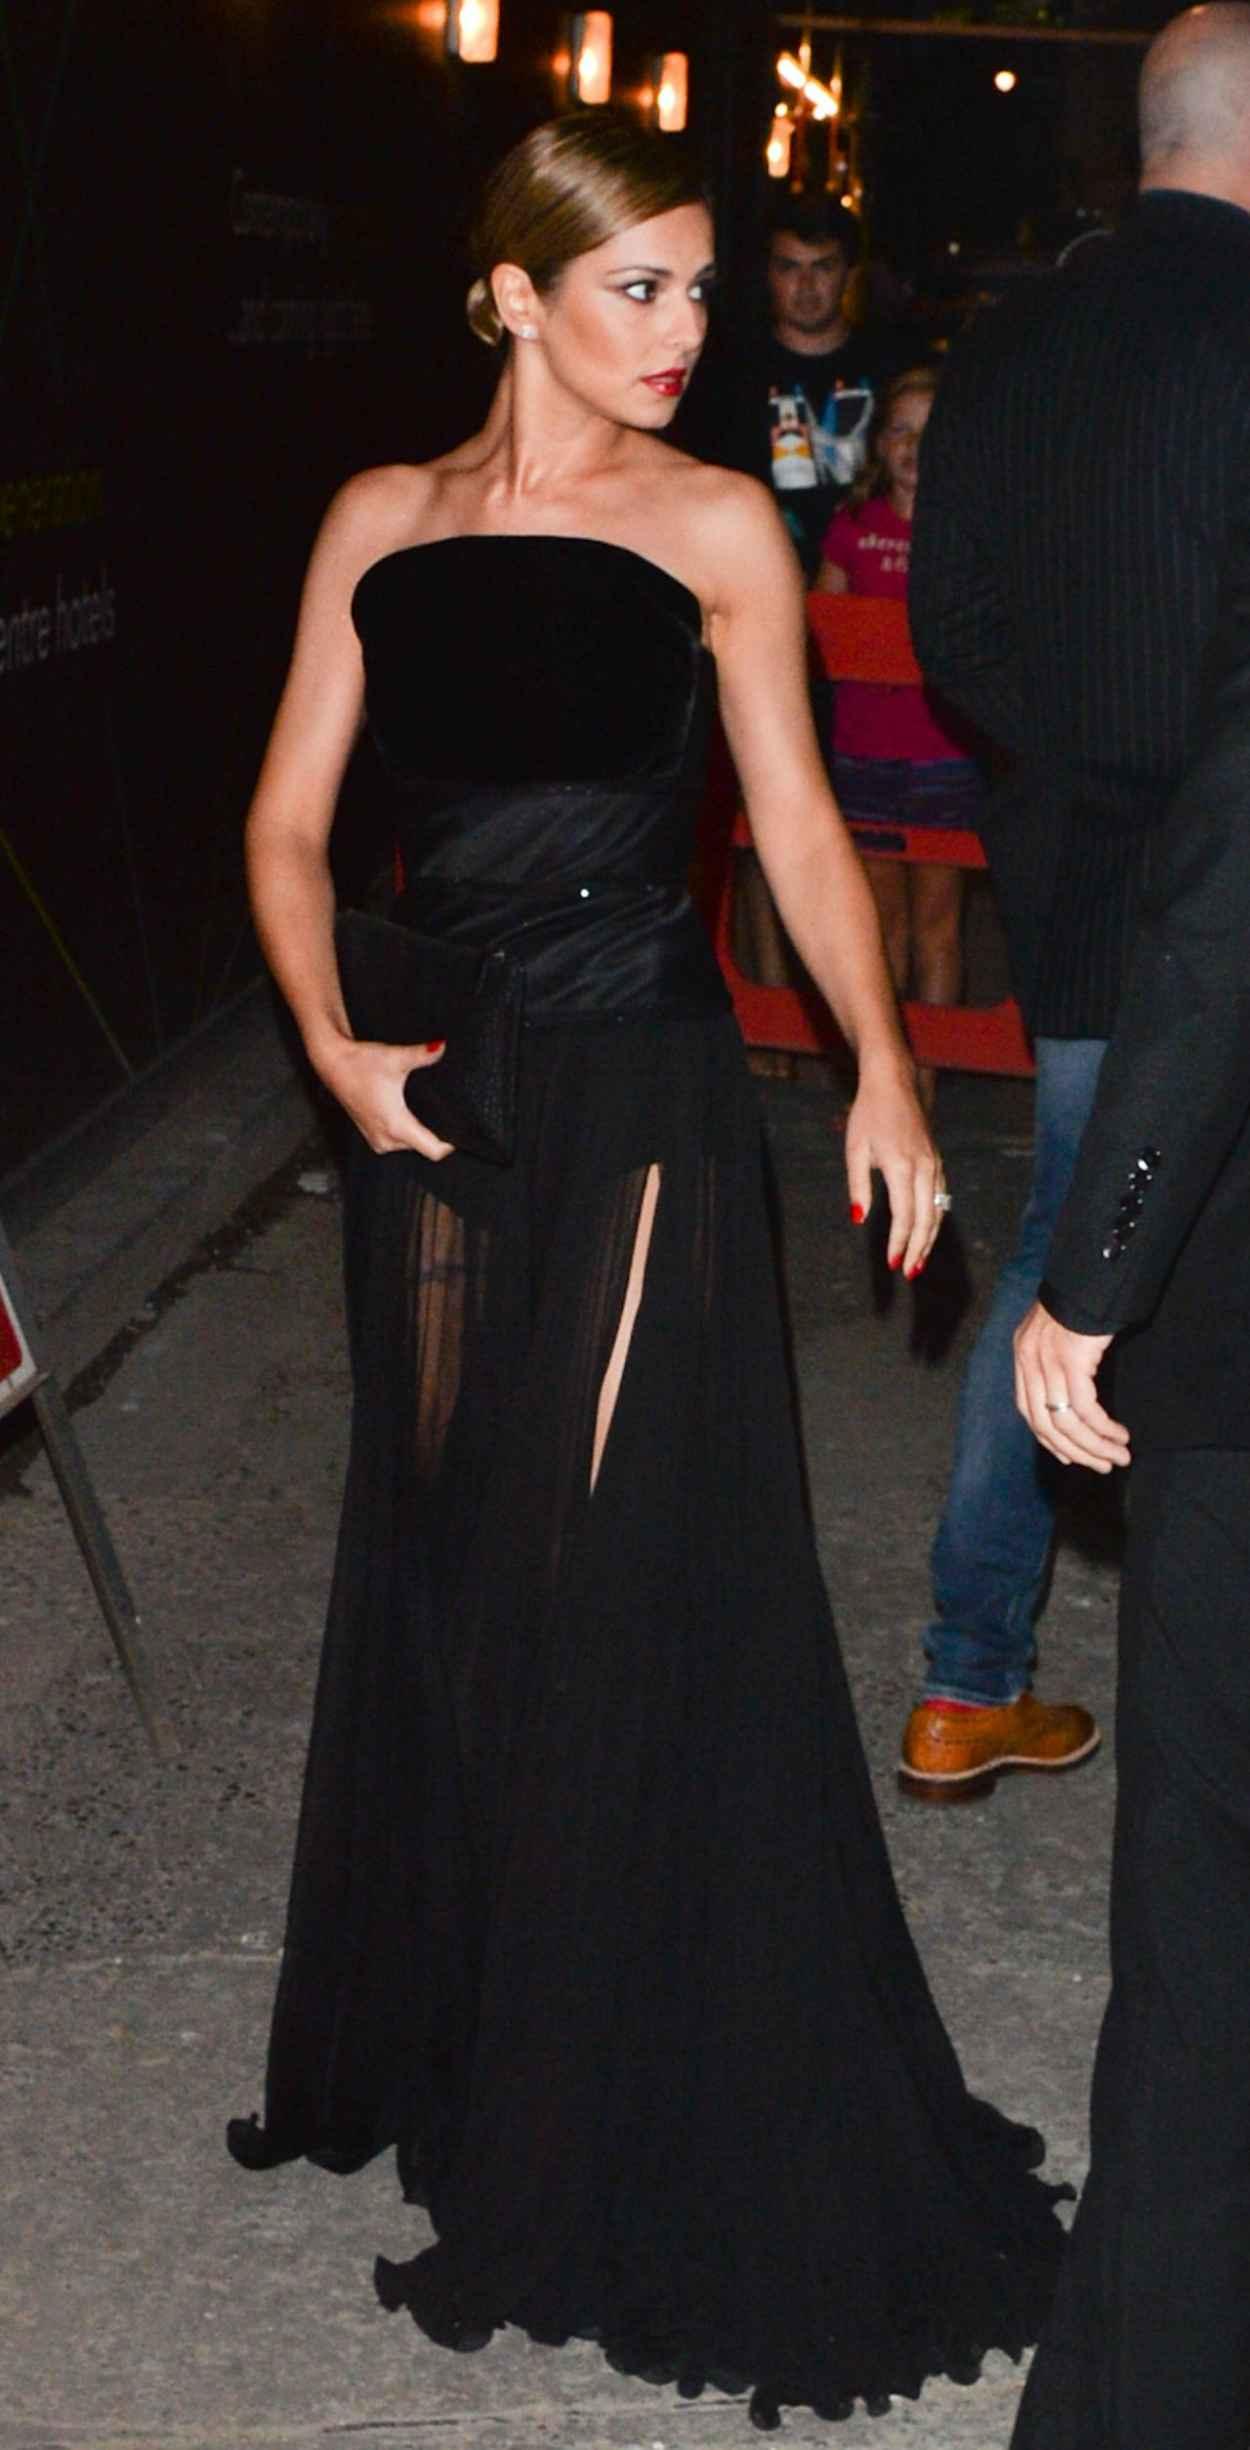 Cheryl Cole (Cheryl Fernandez-Versini) - Wedding Party in London - July 2015-1